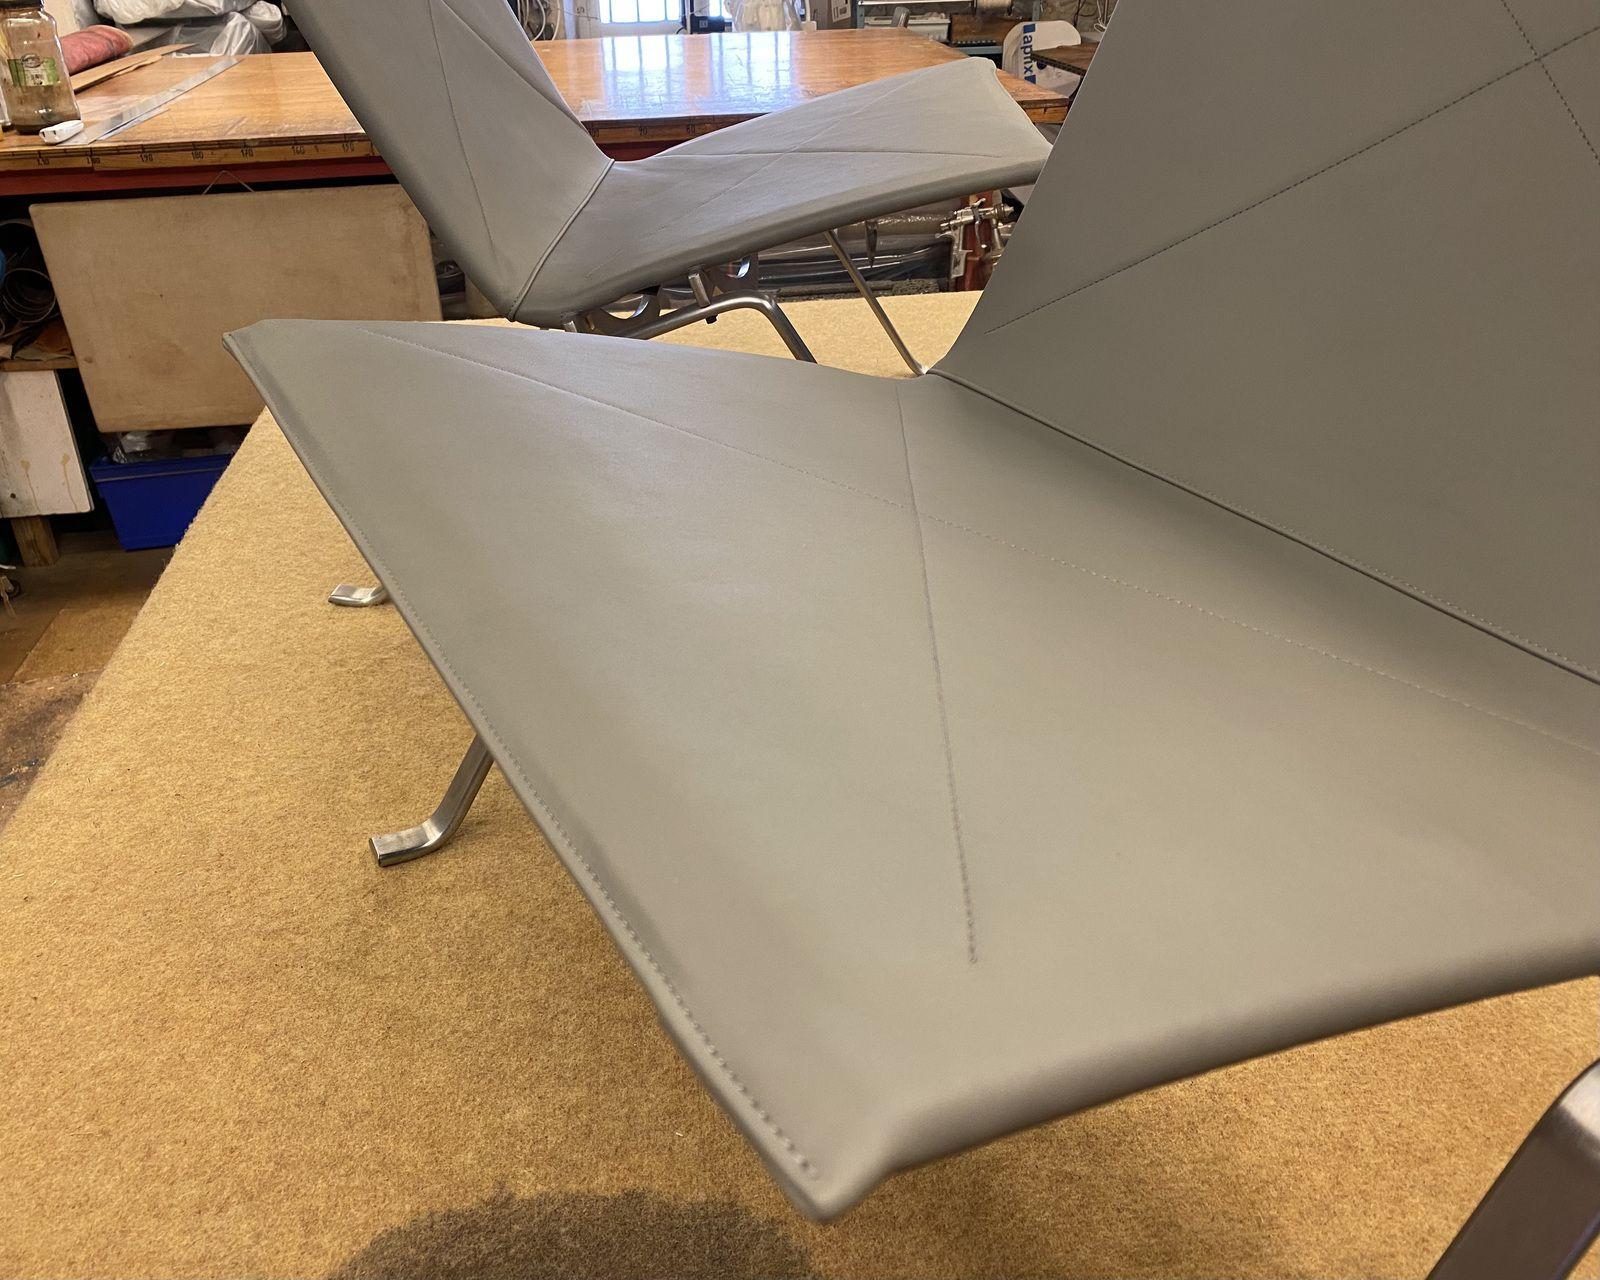 réfection totale deux PK22 en cuir aniline - Atelier Hafner tapissier sellier